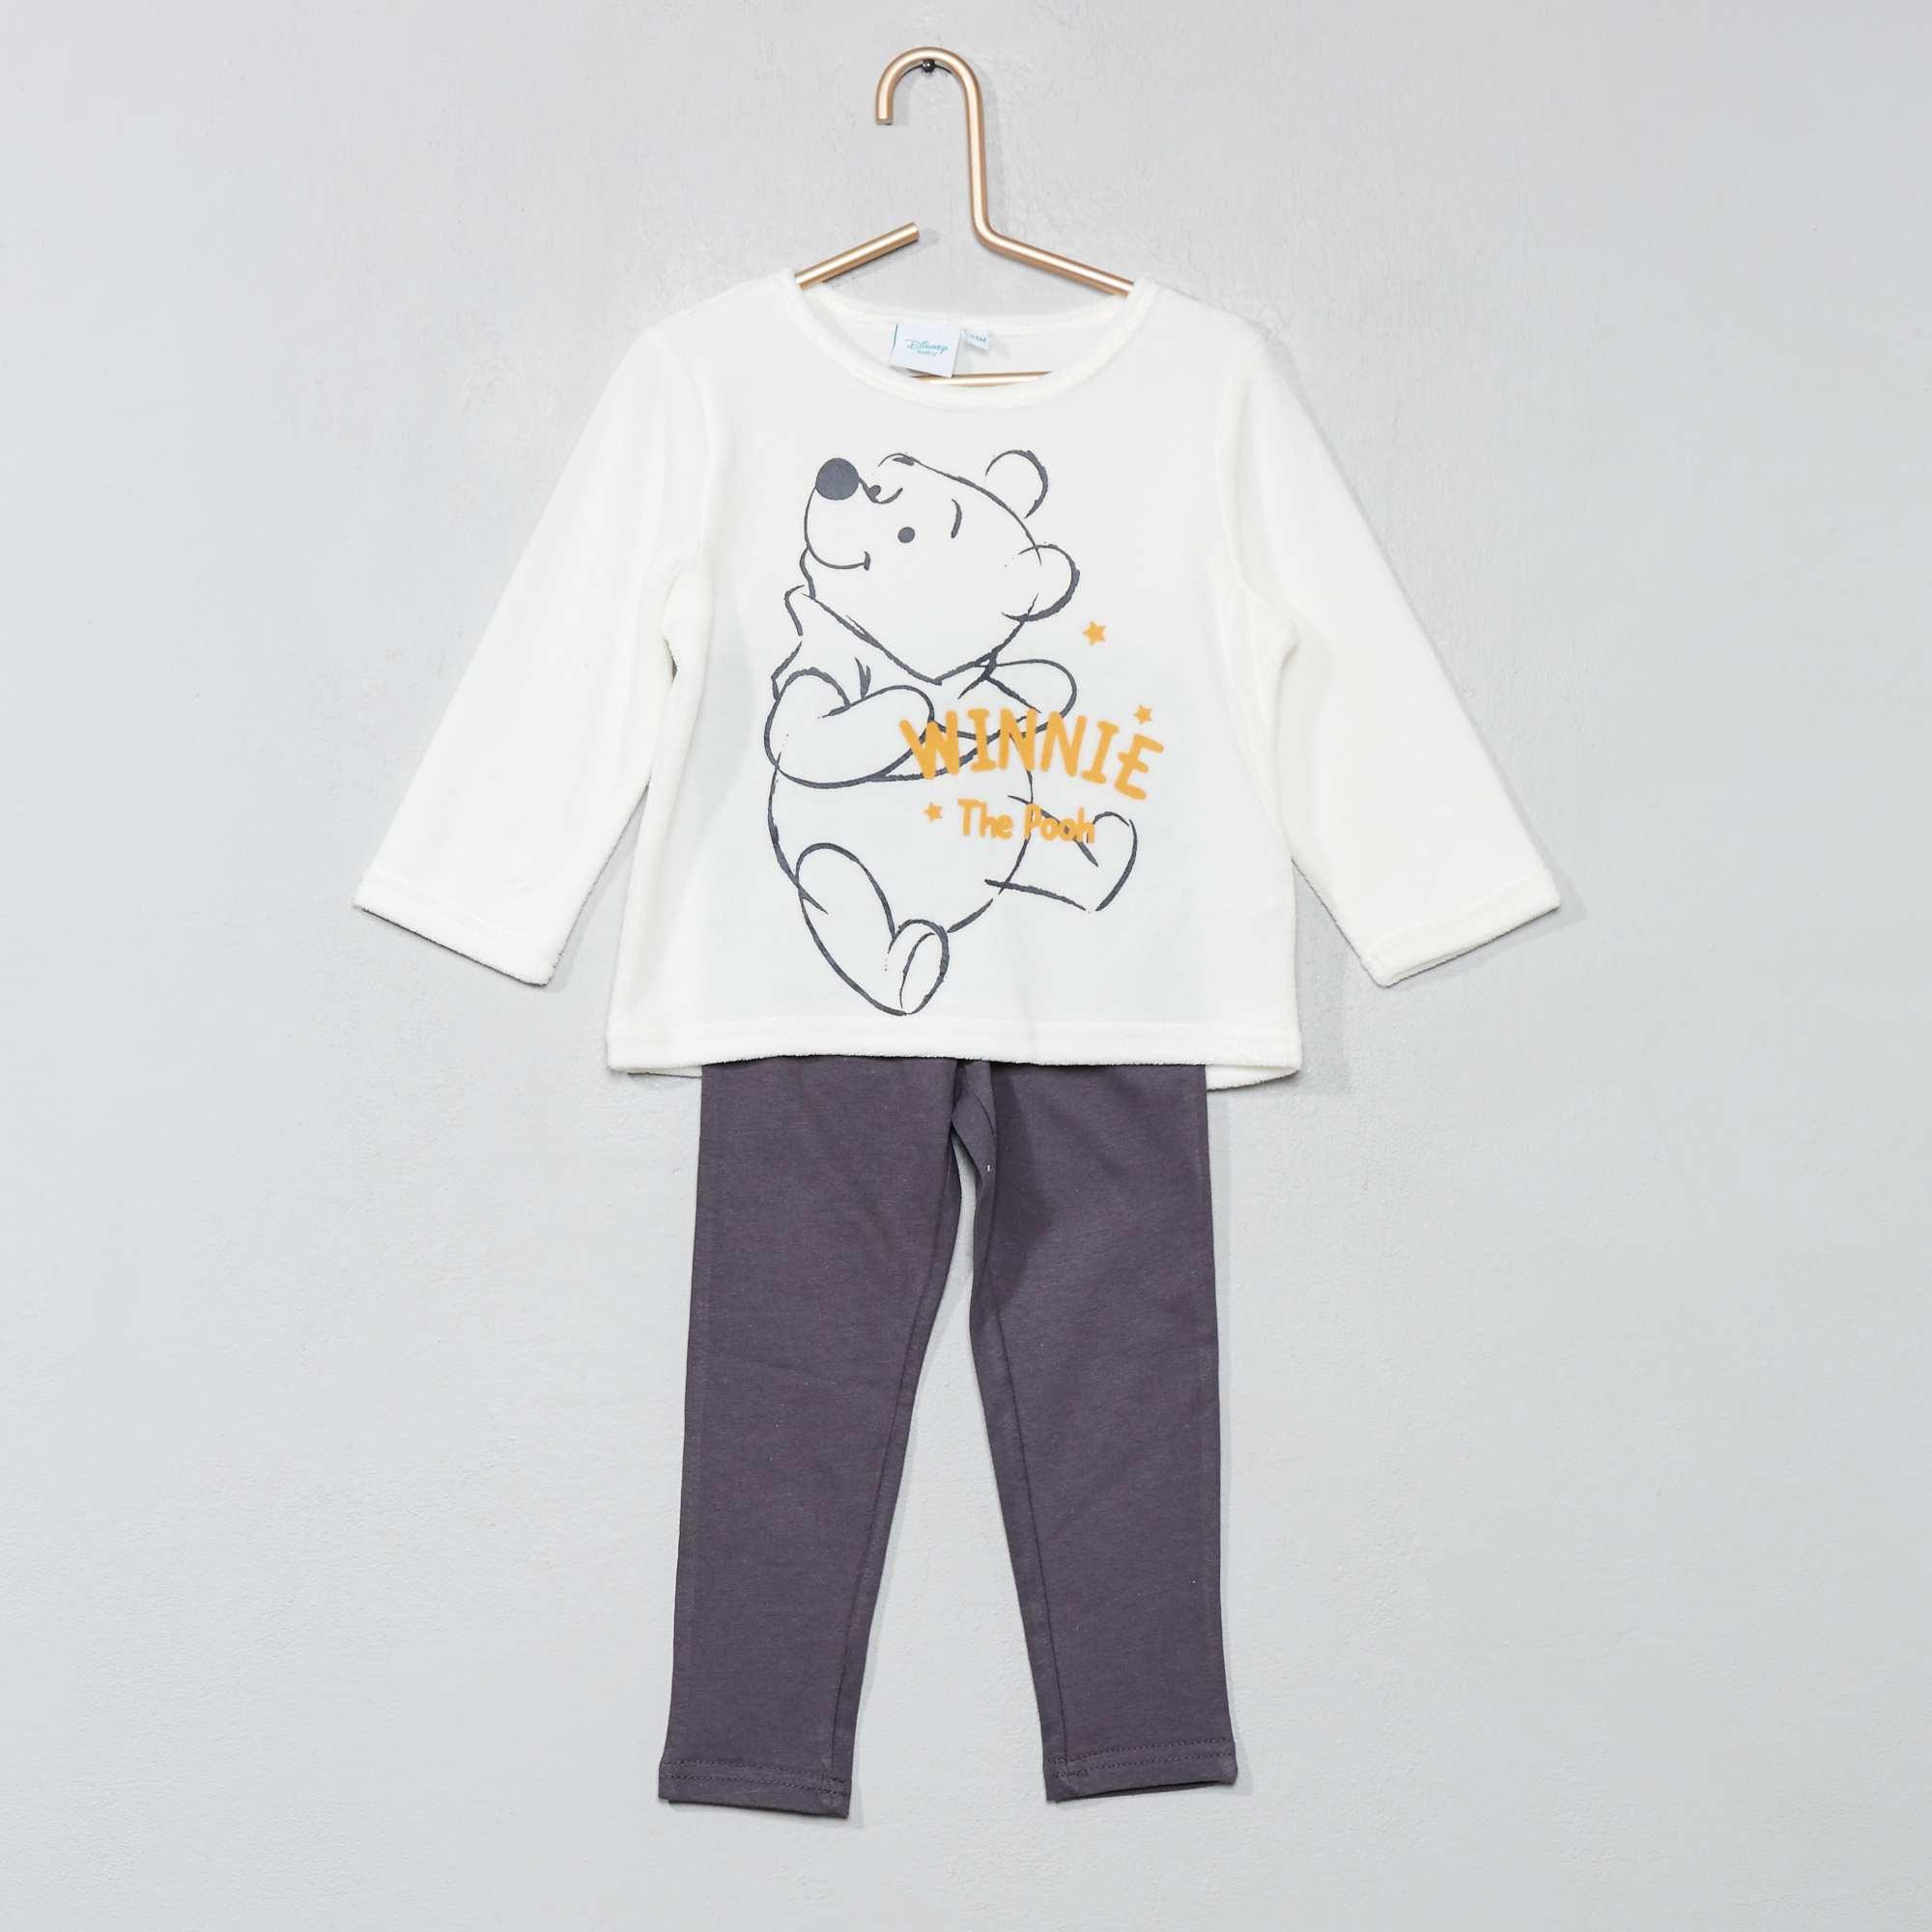 b3955e6fd Pijama de terciopelo y punto 'Mickey' BLANCO Bebé niño. Loading zoom